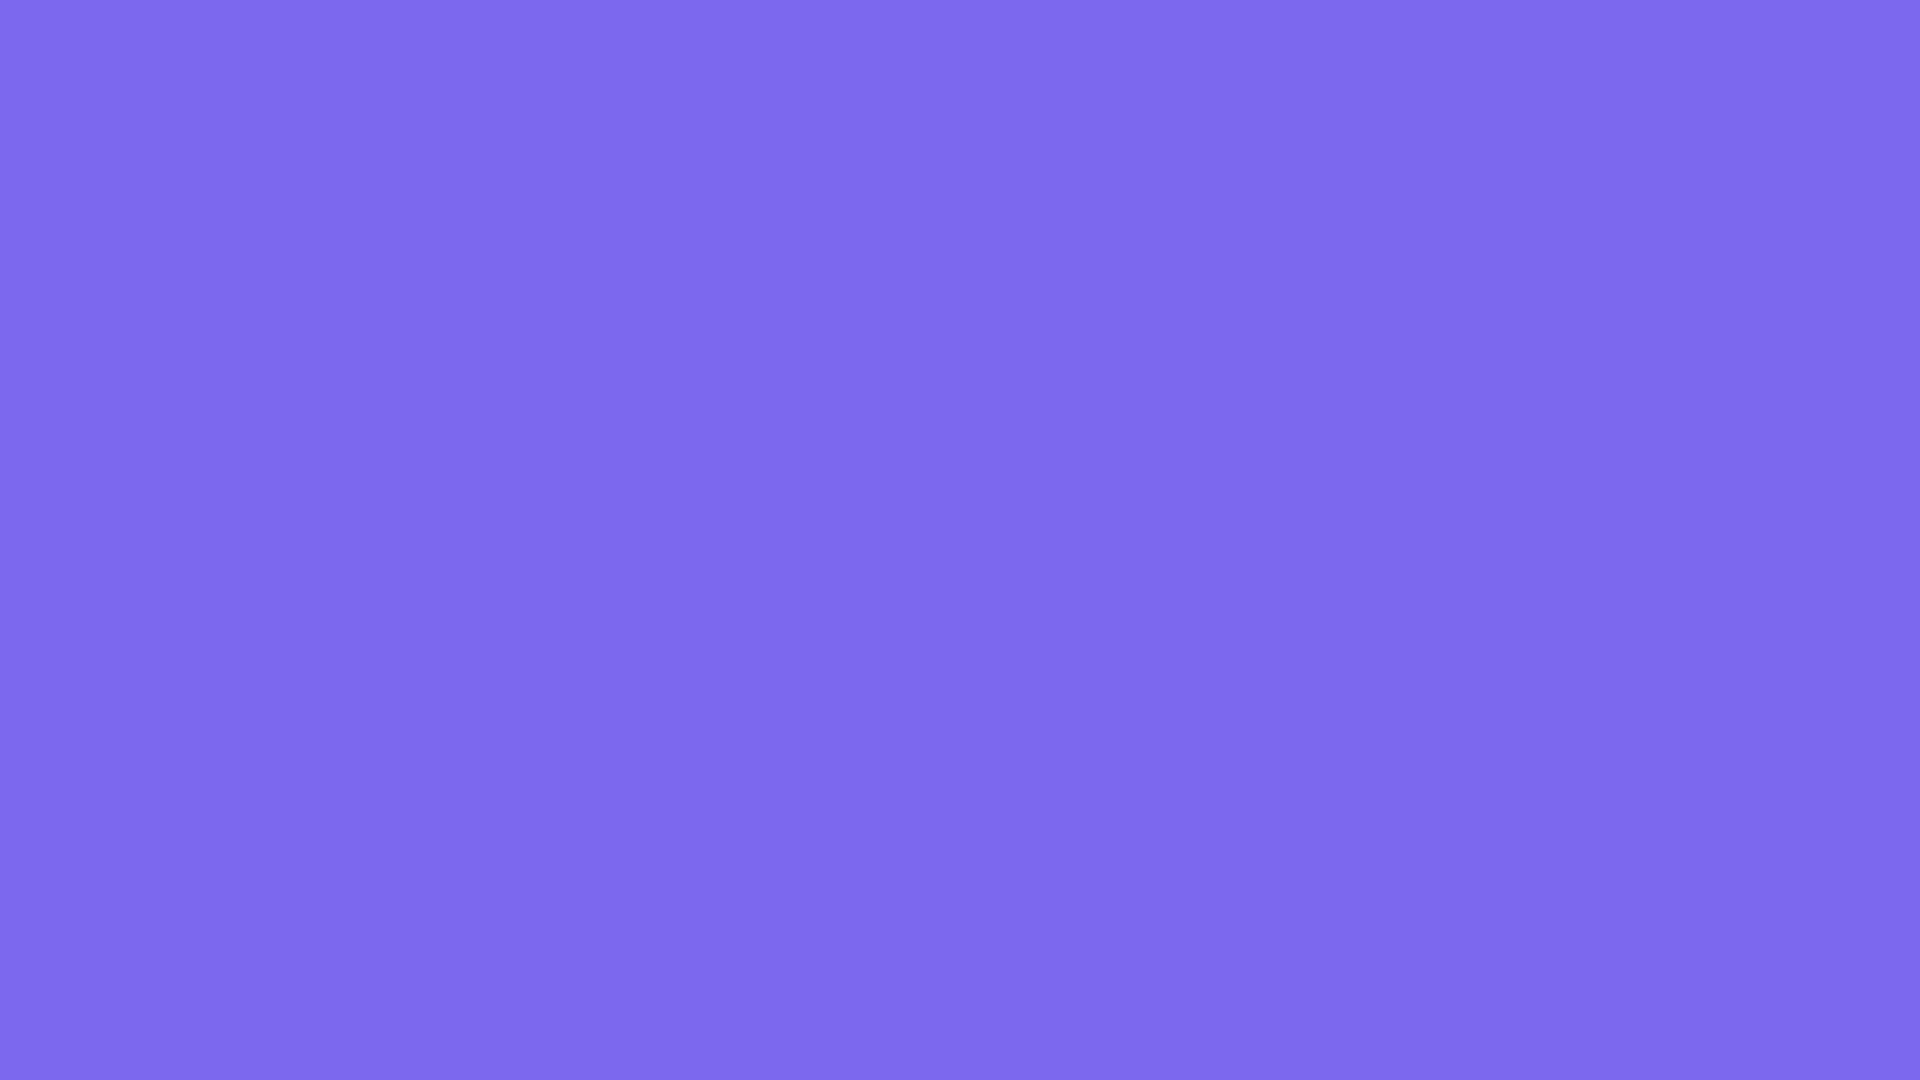 1920x1080 medium slate blue solid color background for The color slate blue